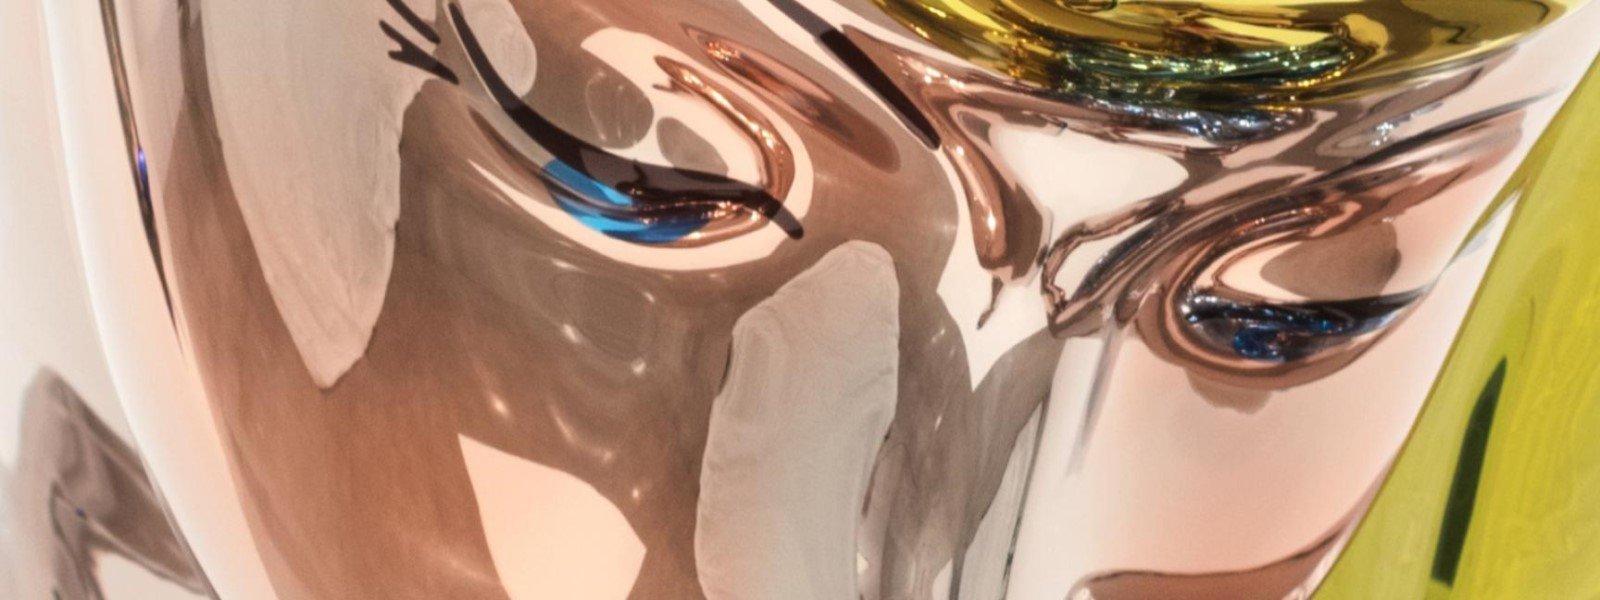 Jeff Koons Exhibition at the Ashmolean Oxford